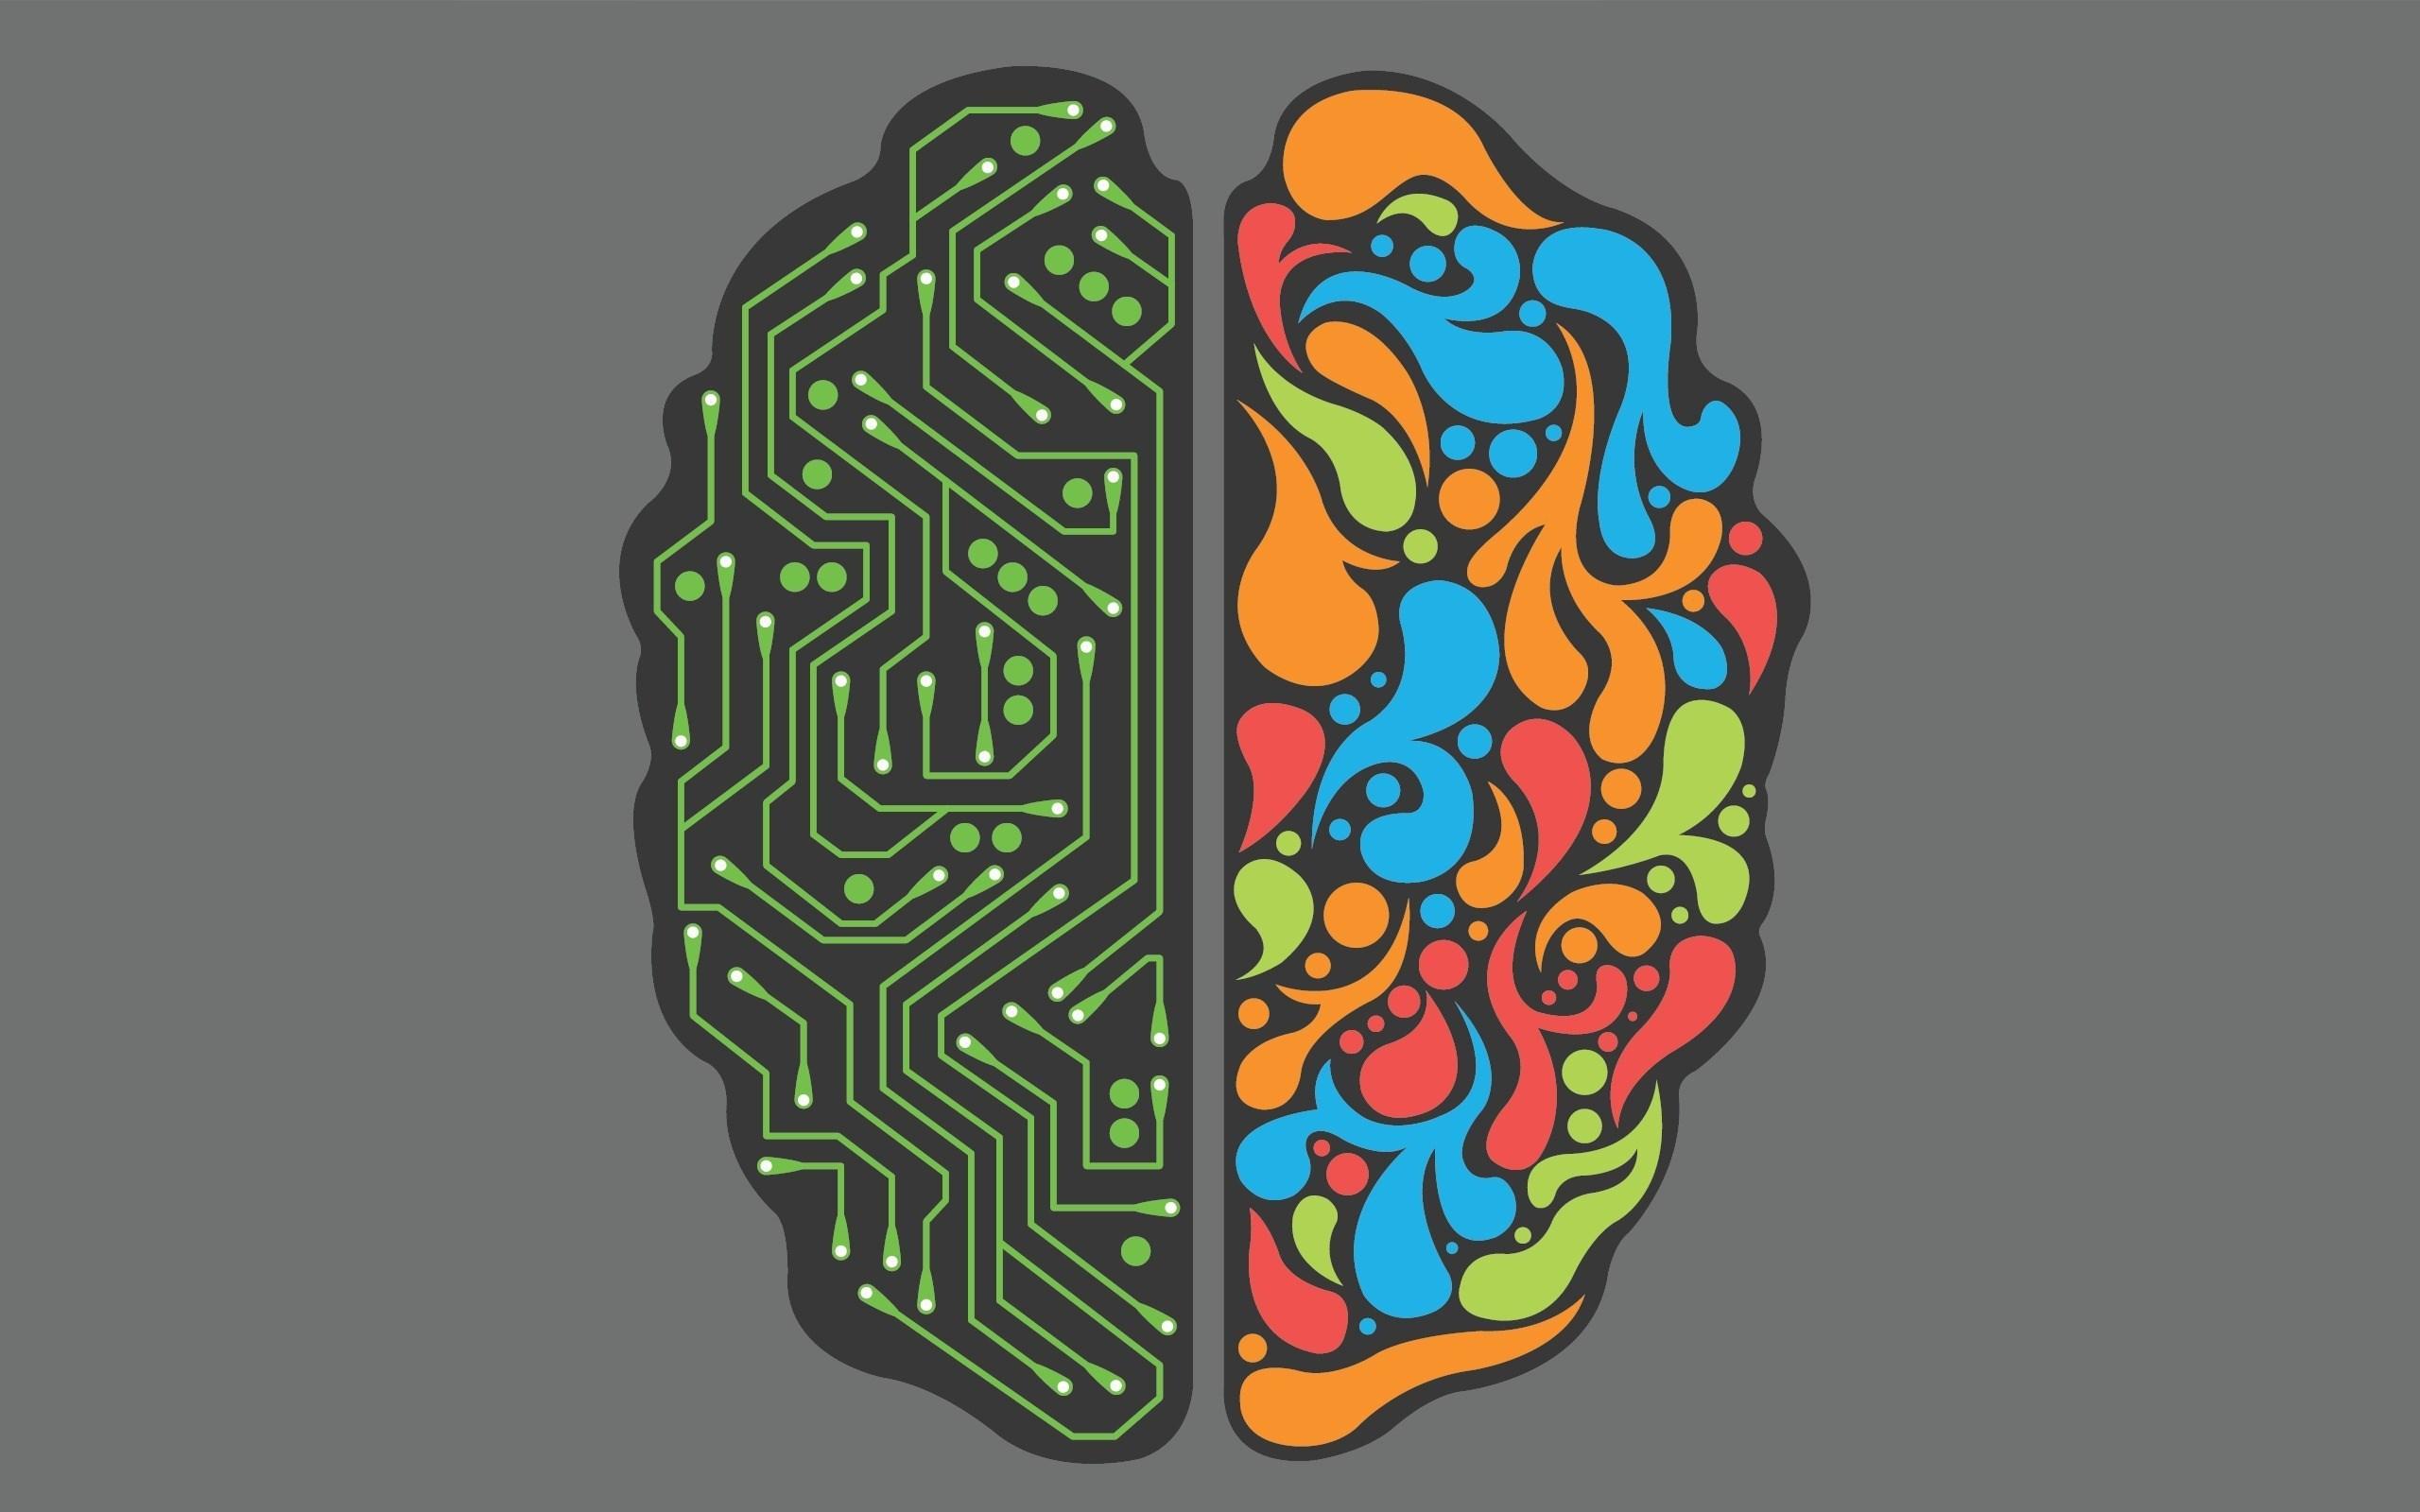 Suhteemme tietoon muuttuu.